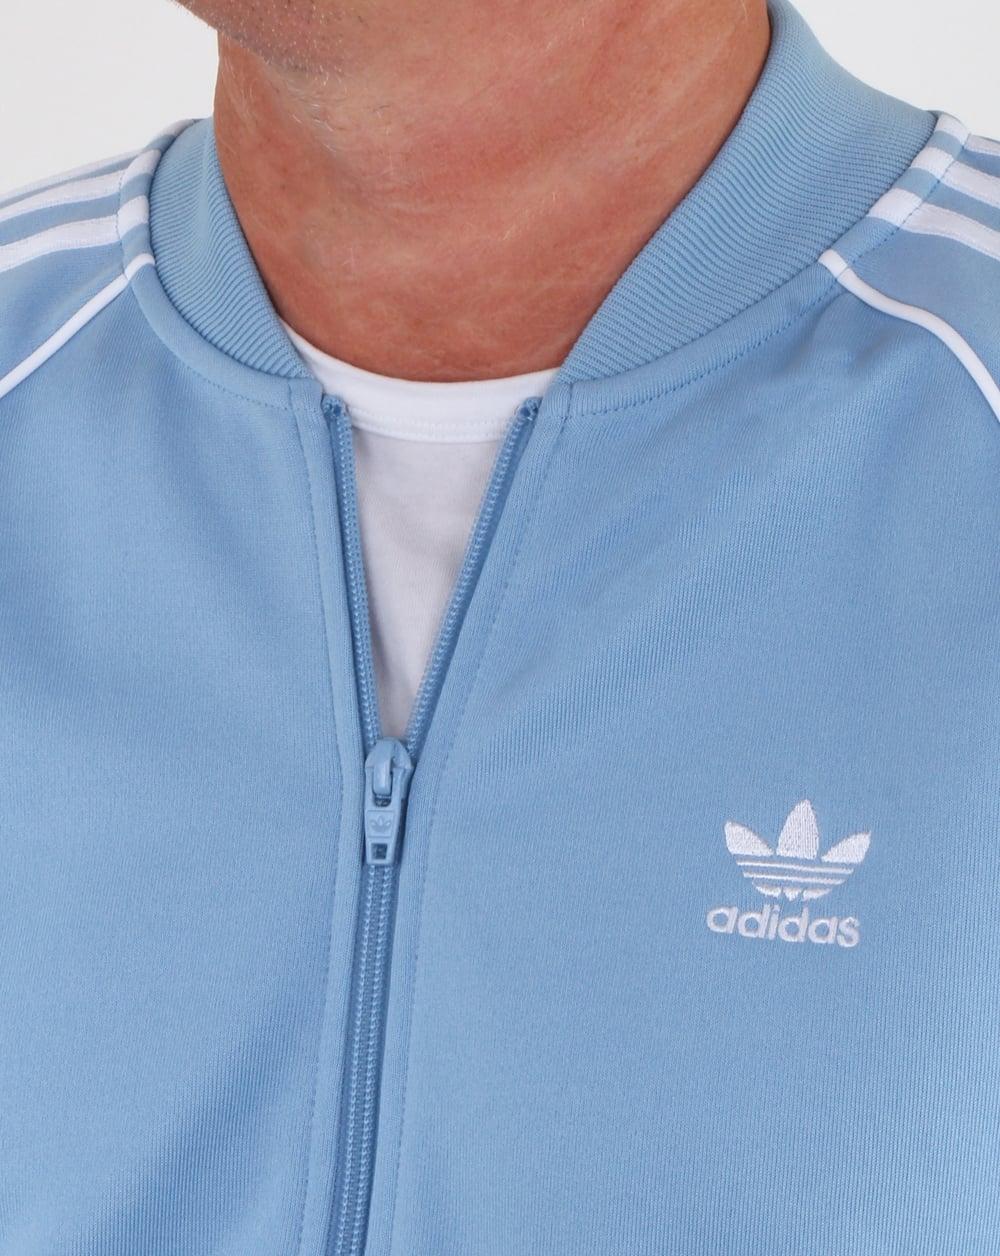 1d205f4b4958 Adidas Originals Superstar Track Top Sky Blue